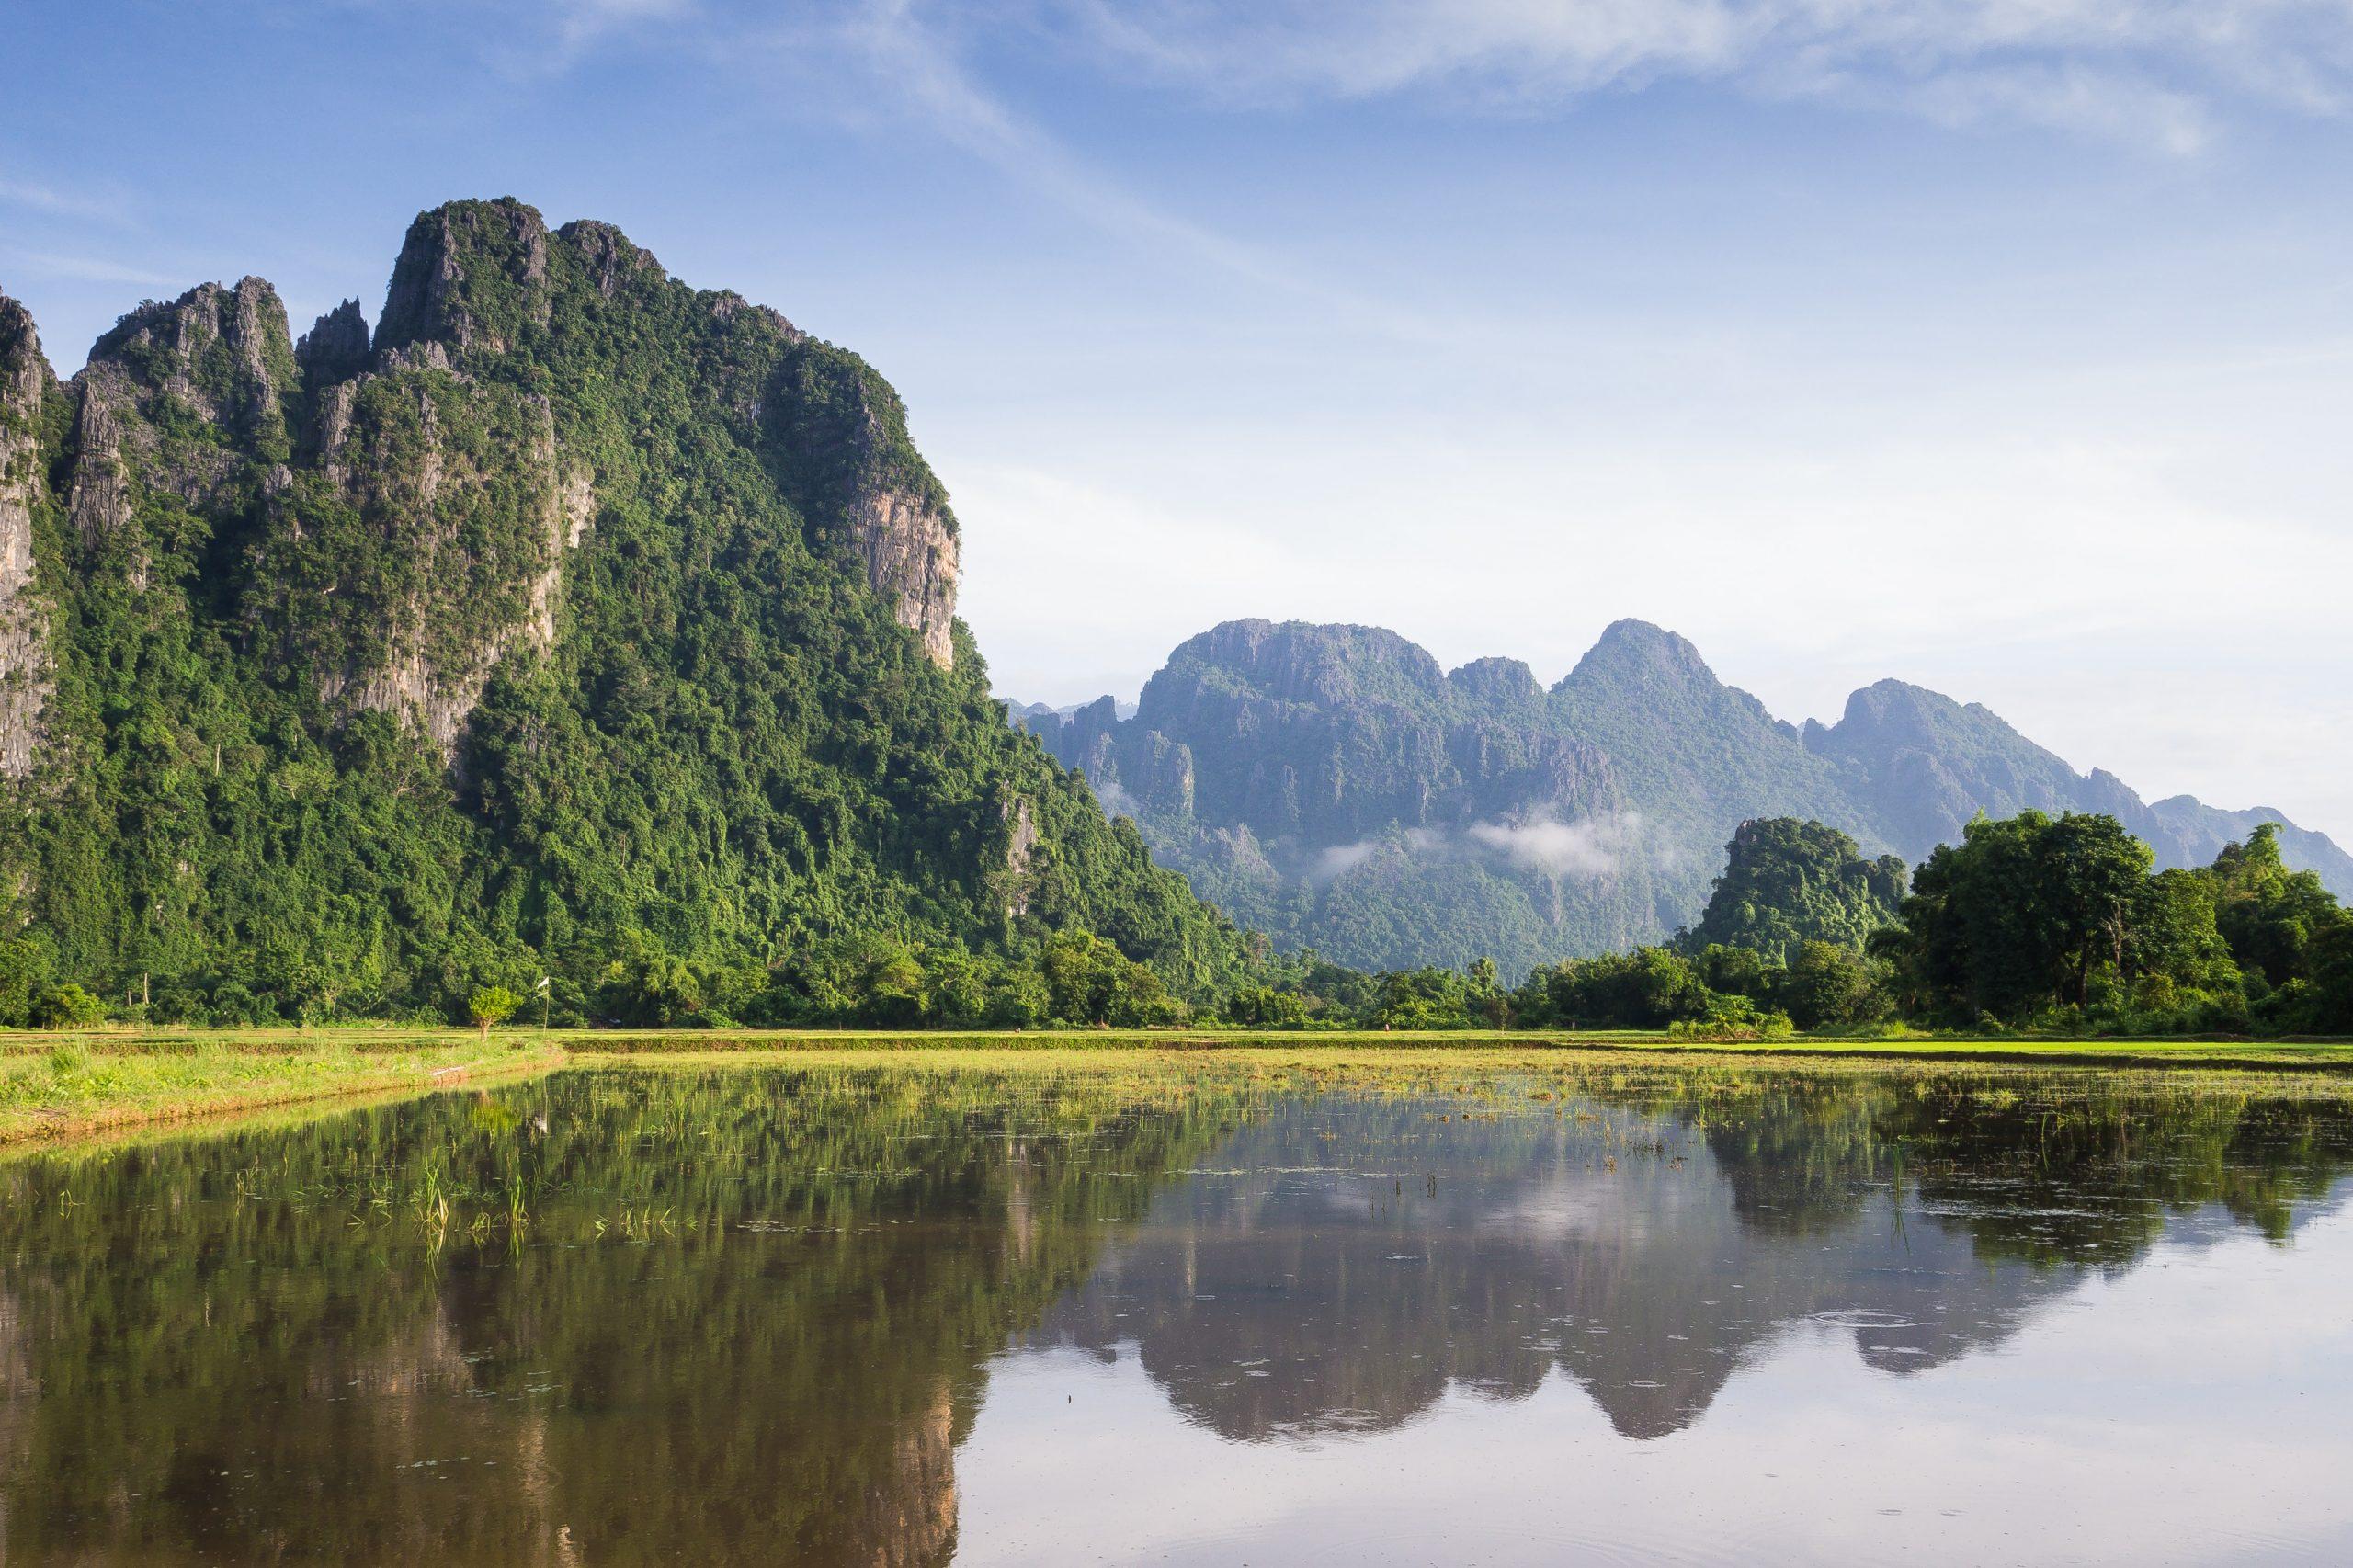 A lakeside mountain view in Laos